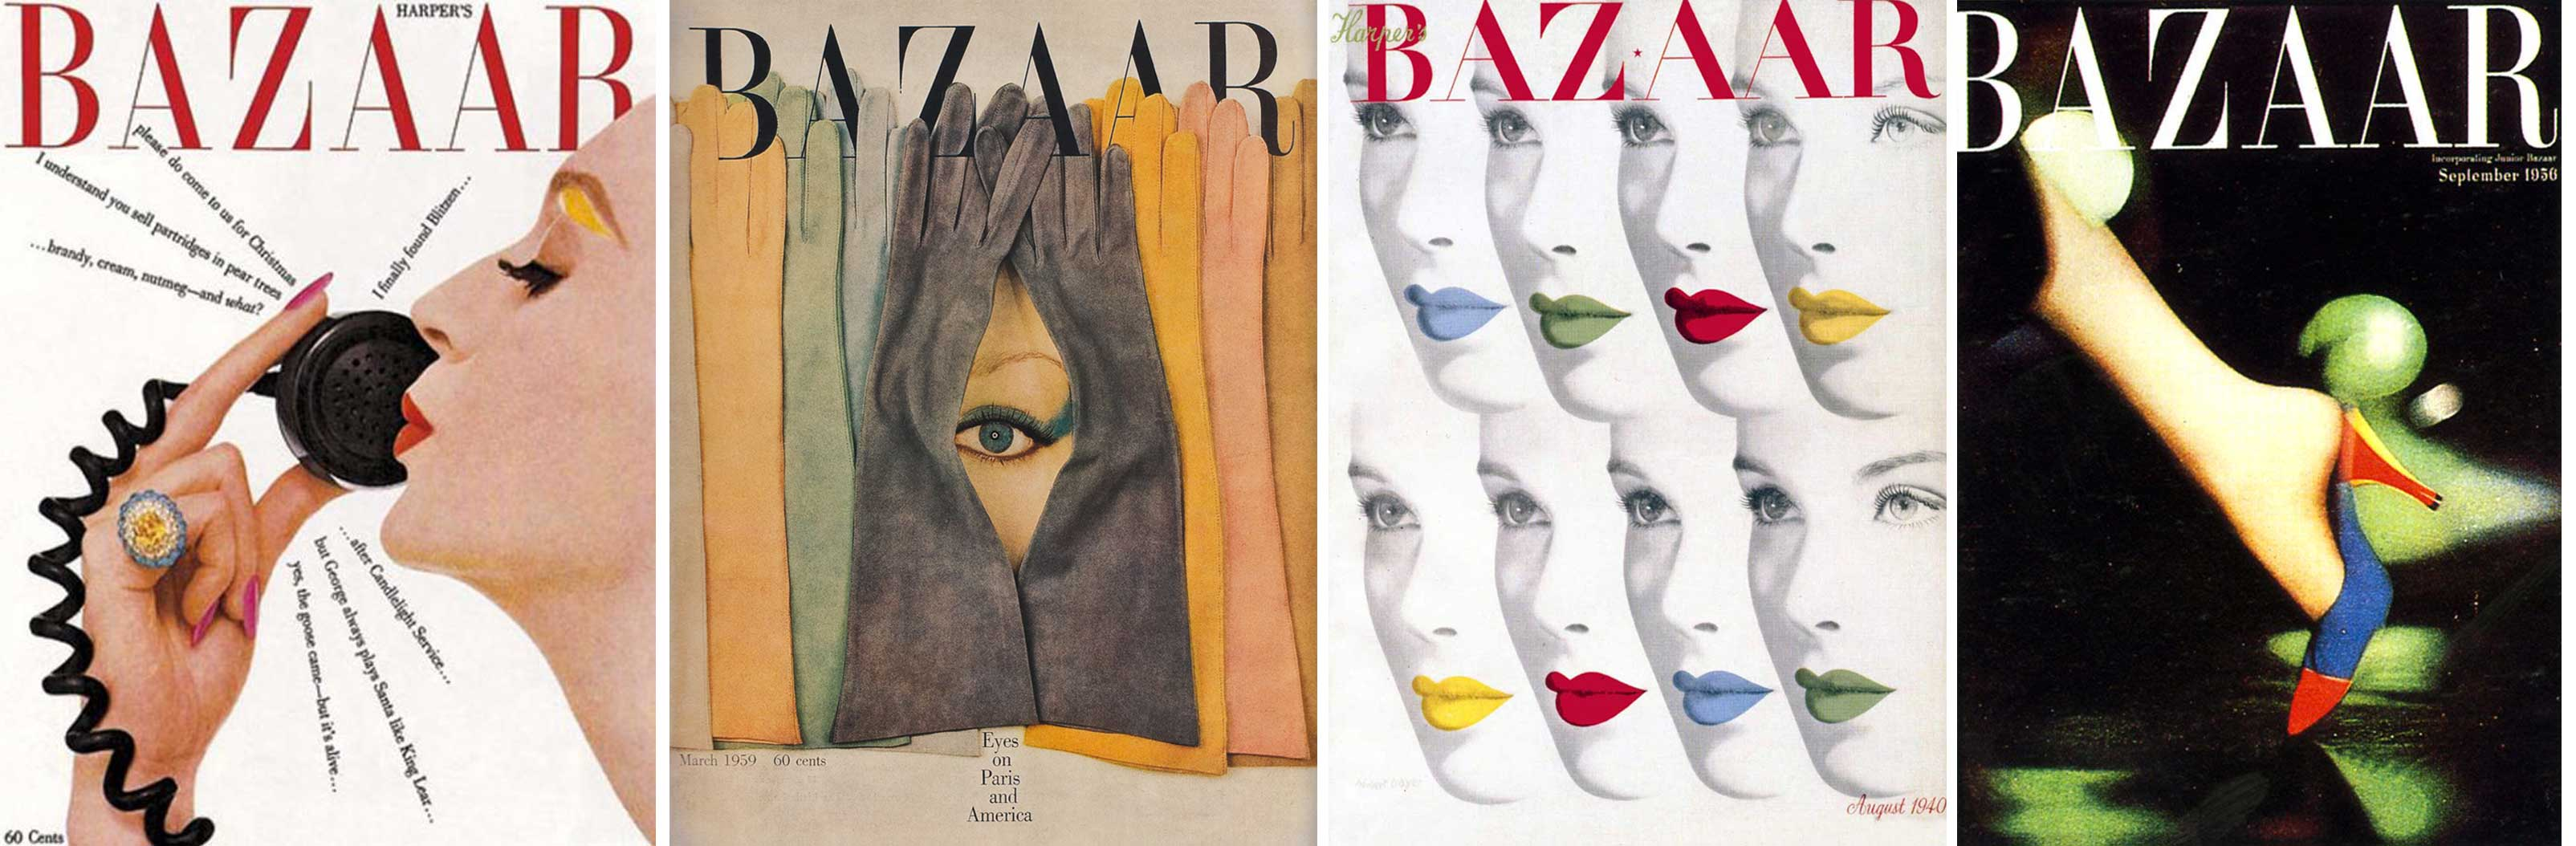 Alexey-Brodovitch-harper-s-bazaar-couvertures-02